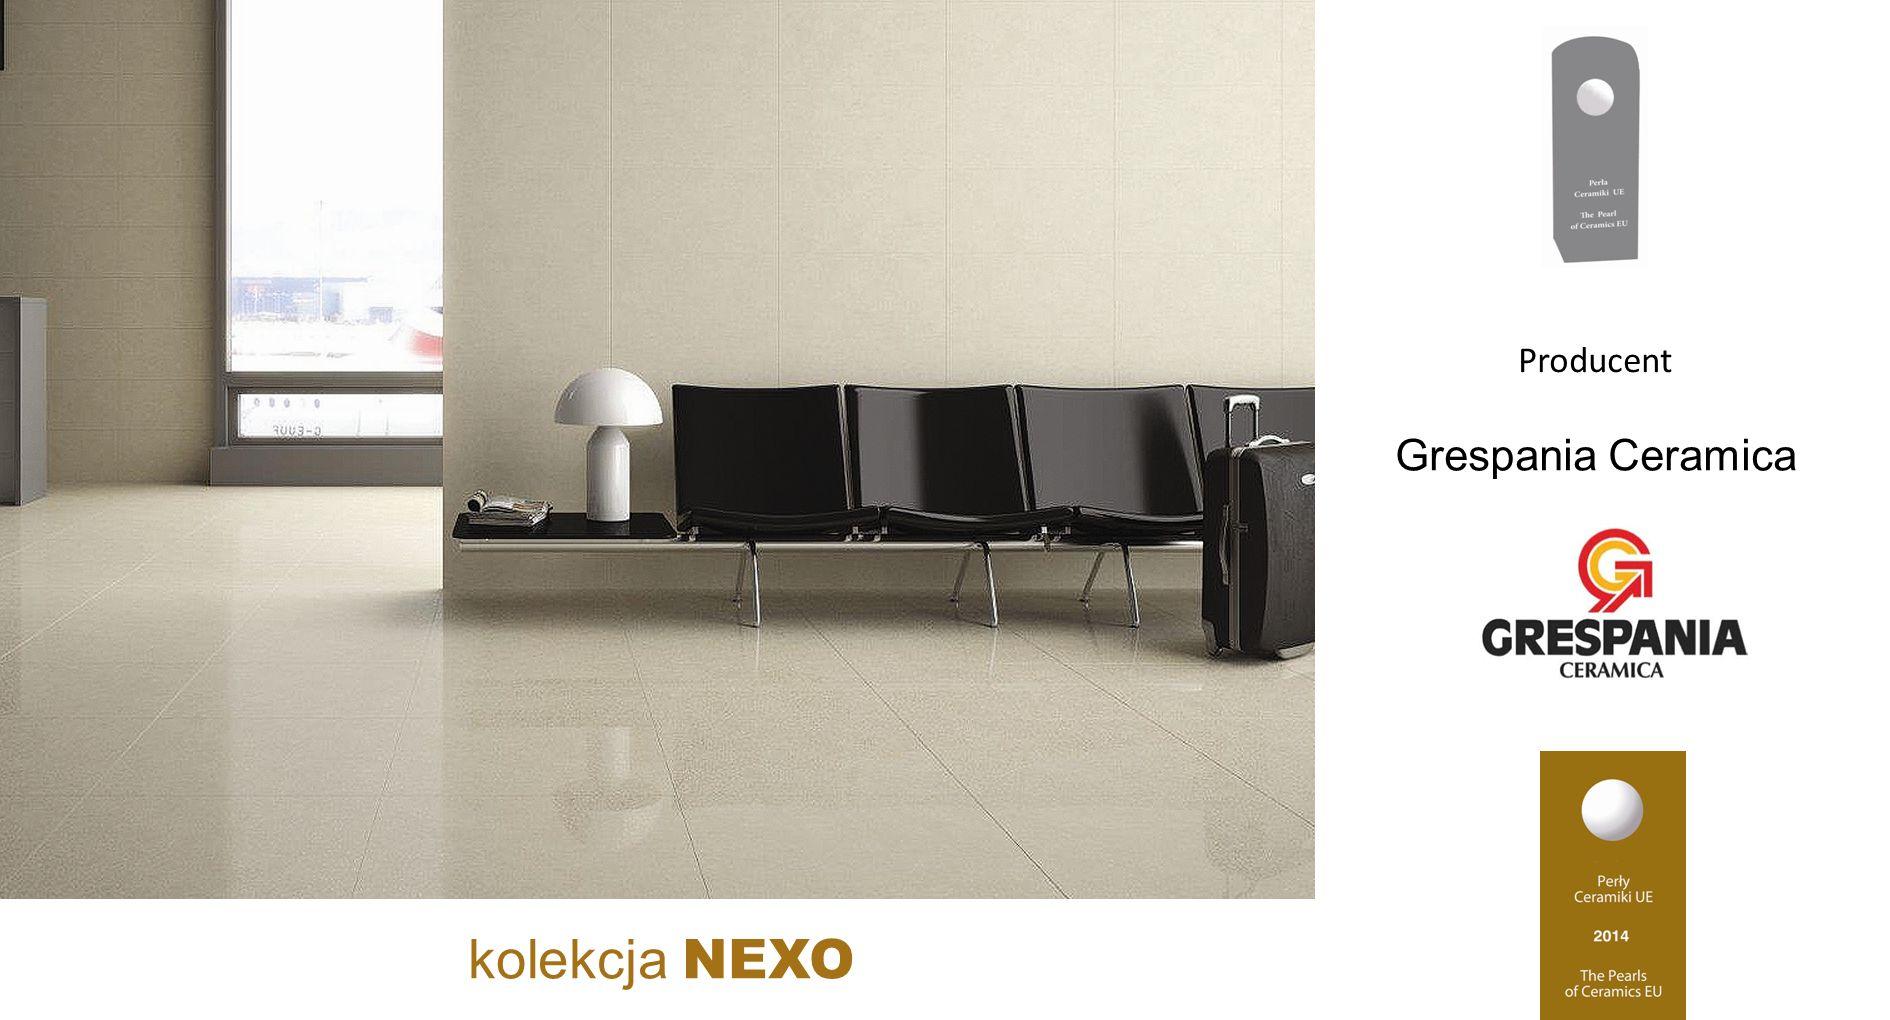 kolekcja NEXO Producent Grespania Ceramica